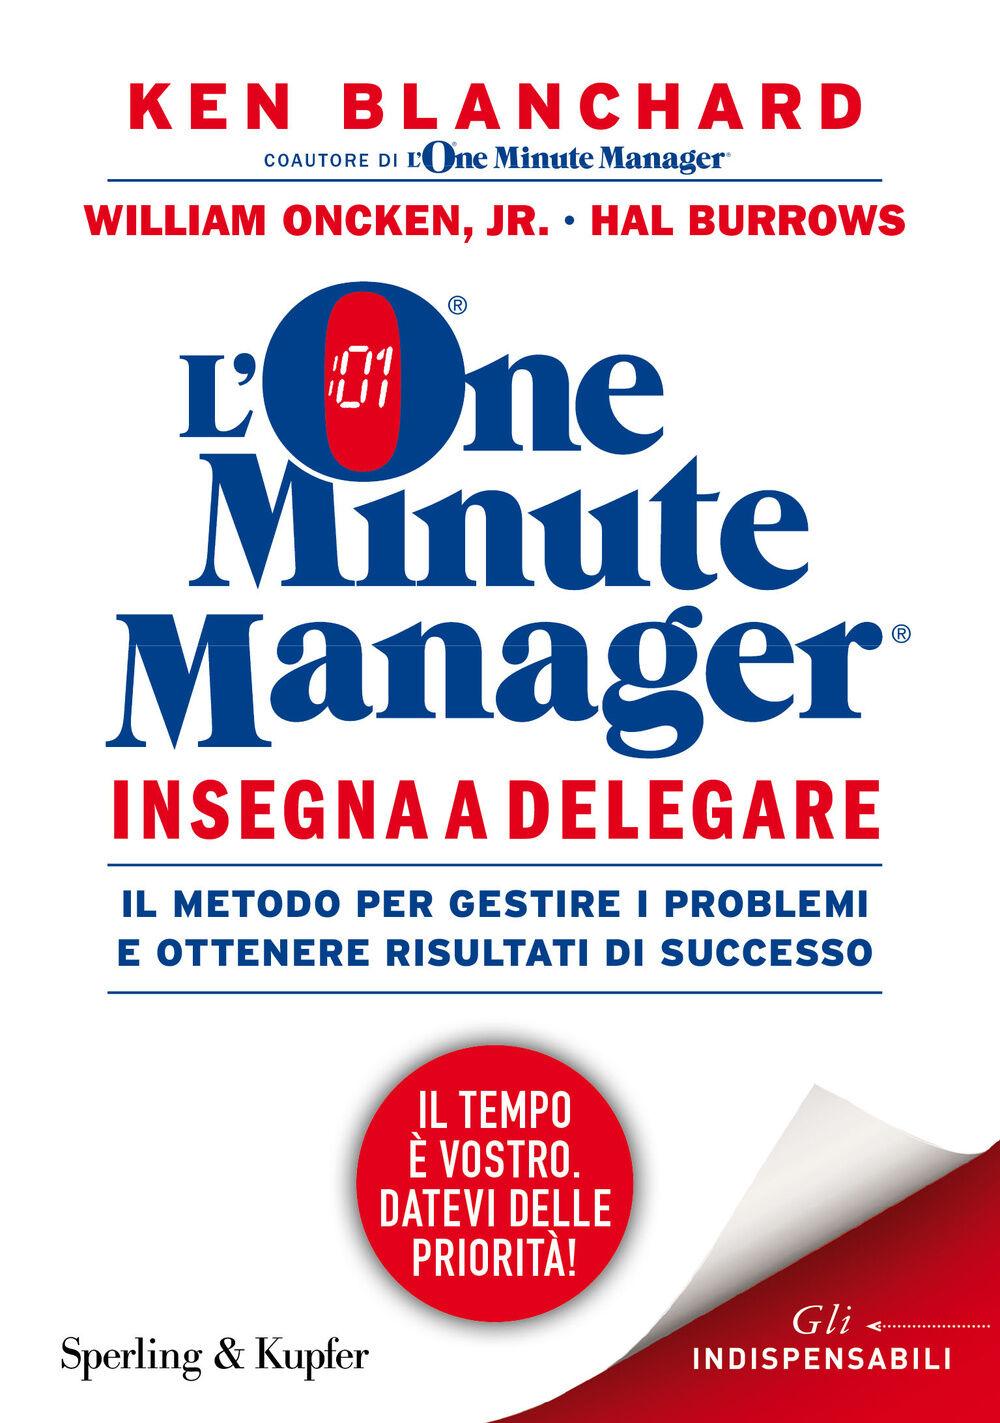 L' one minute manager insegna a delegare